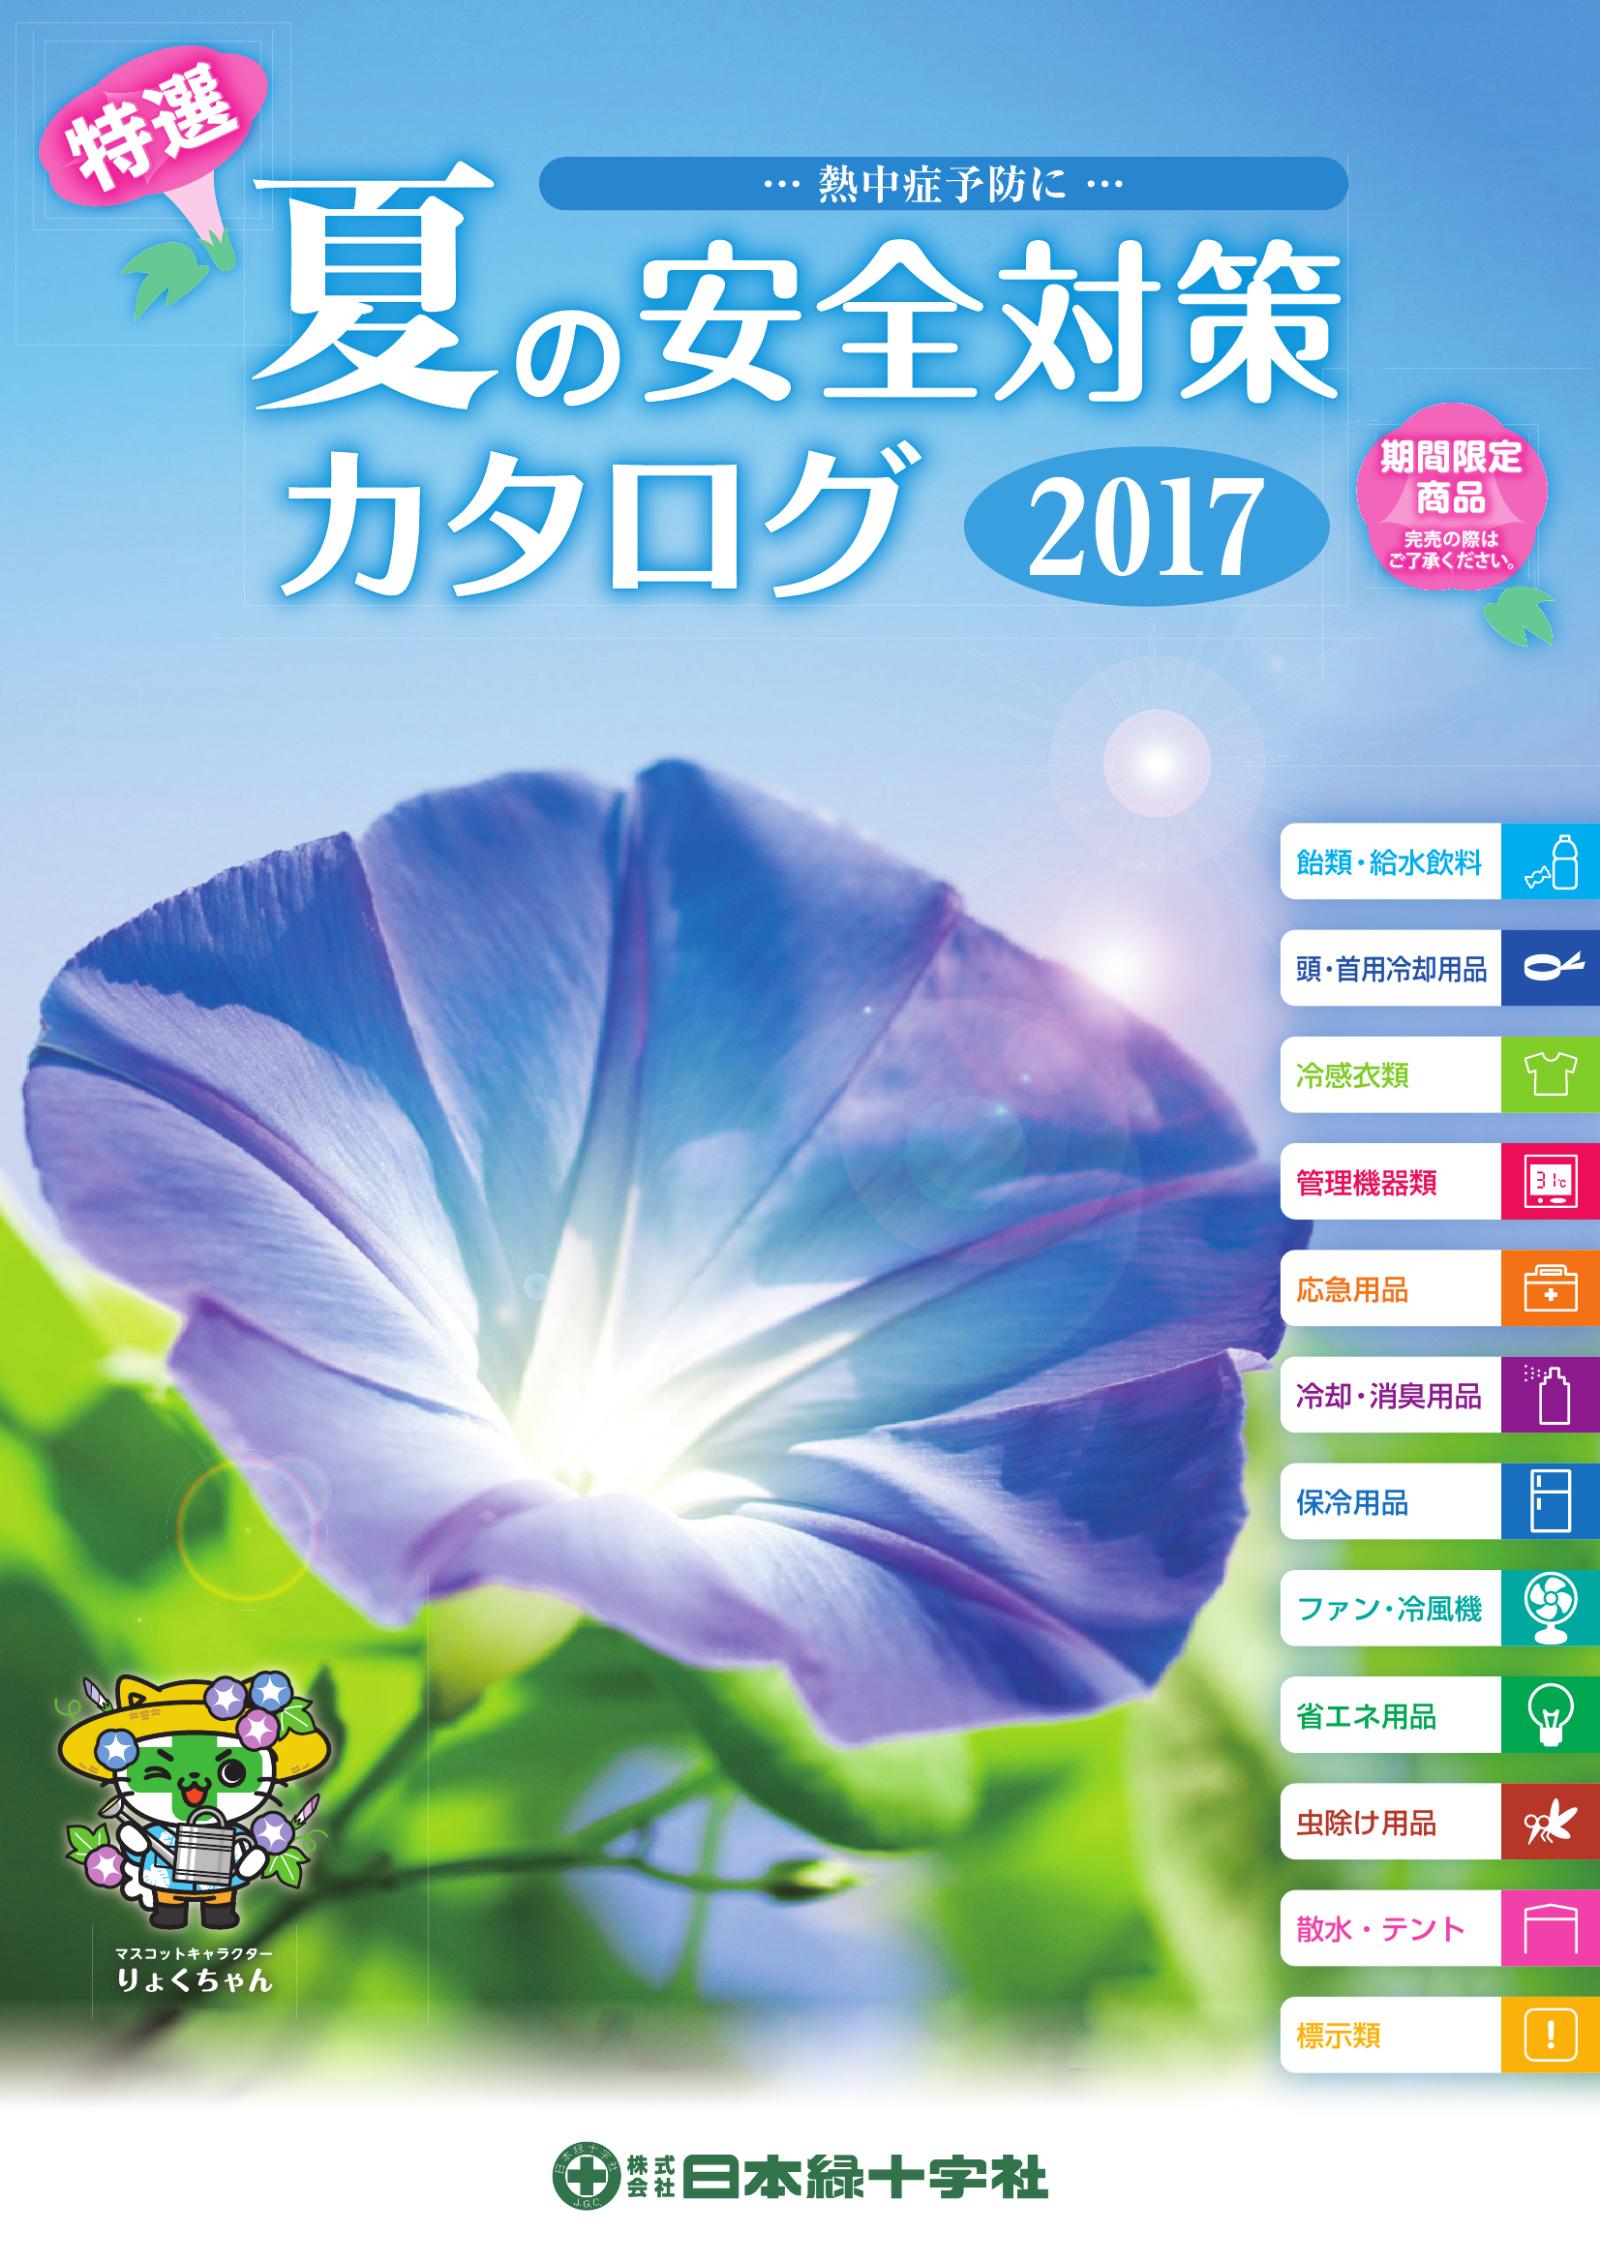 natsuno2017_0001